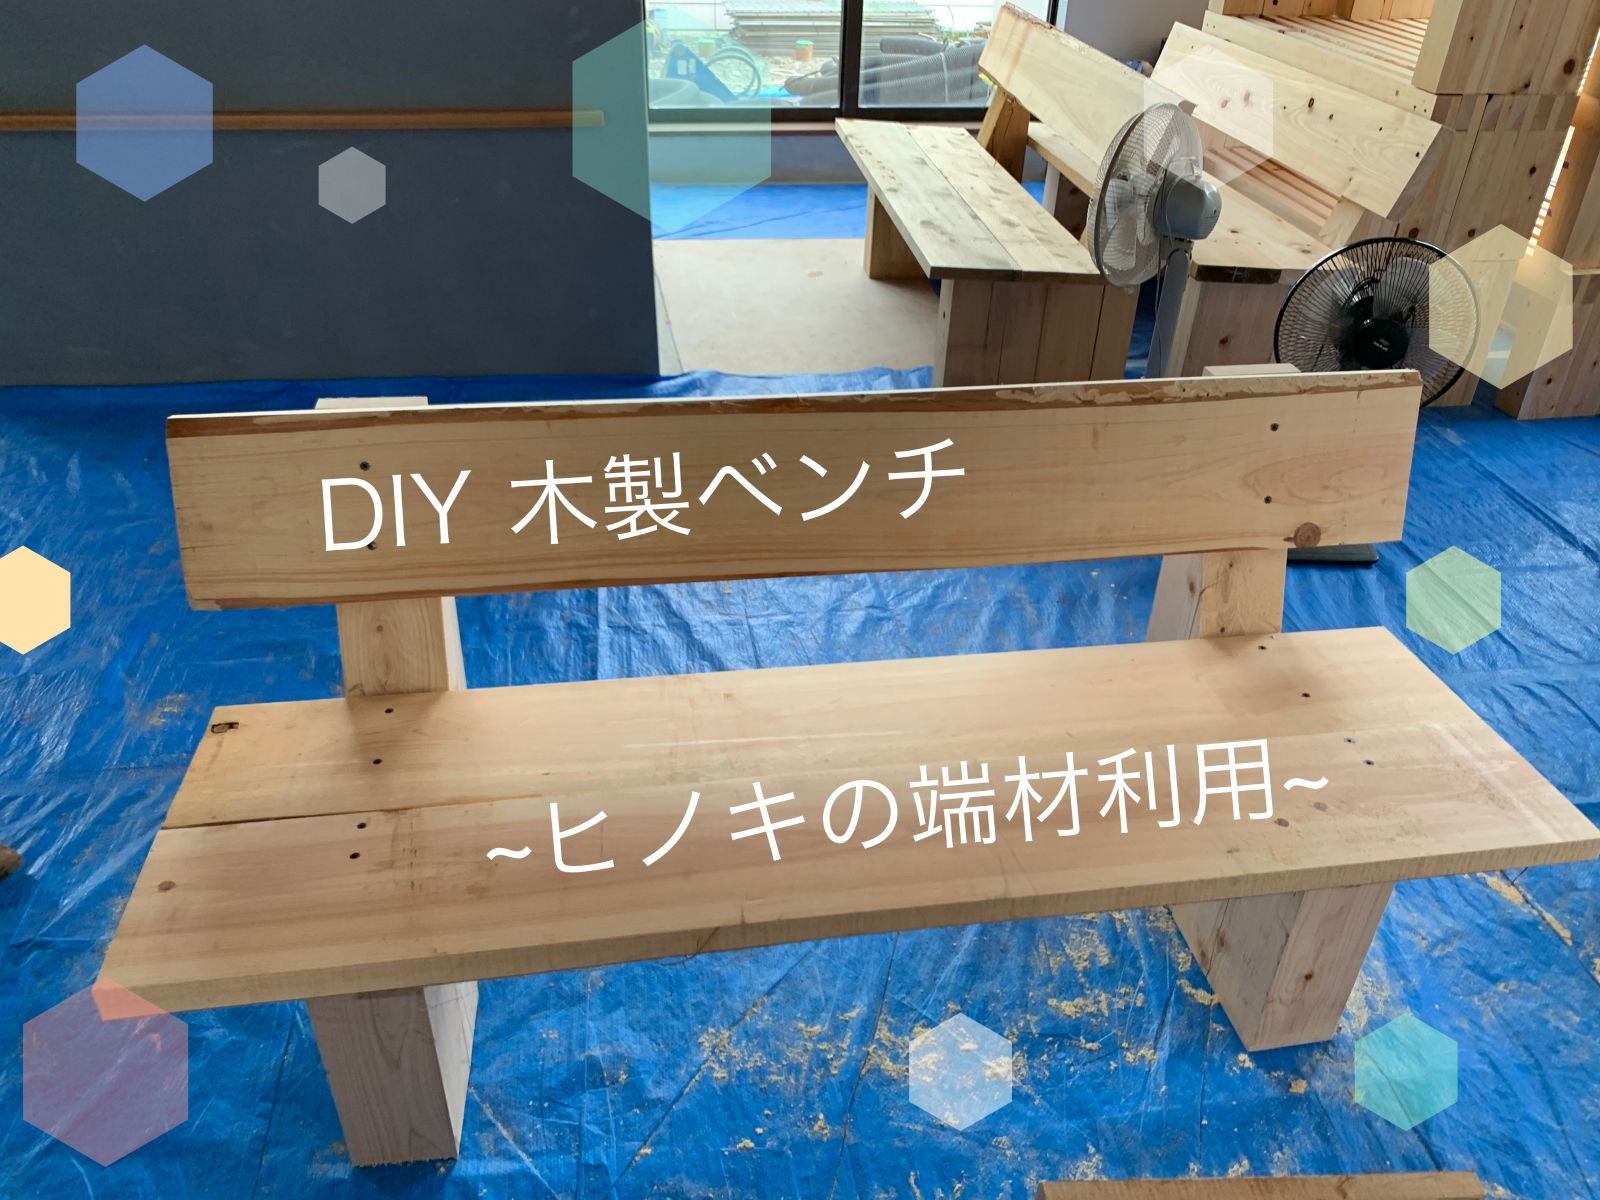 DIY木製ベンチ